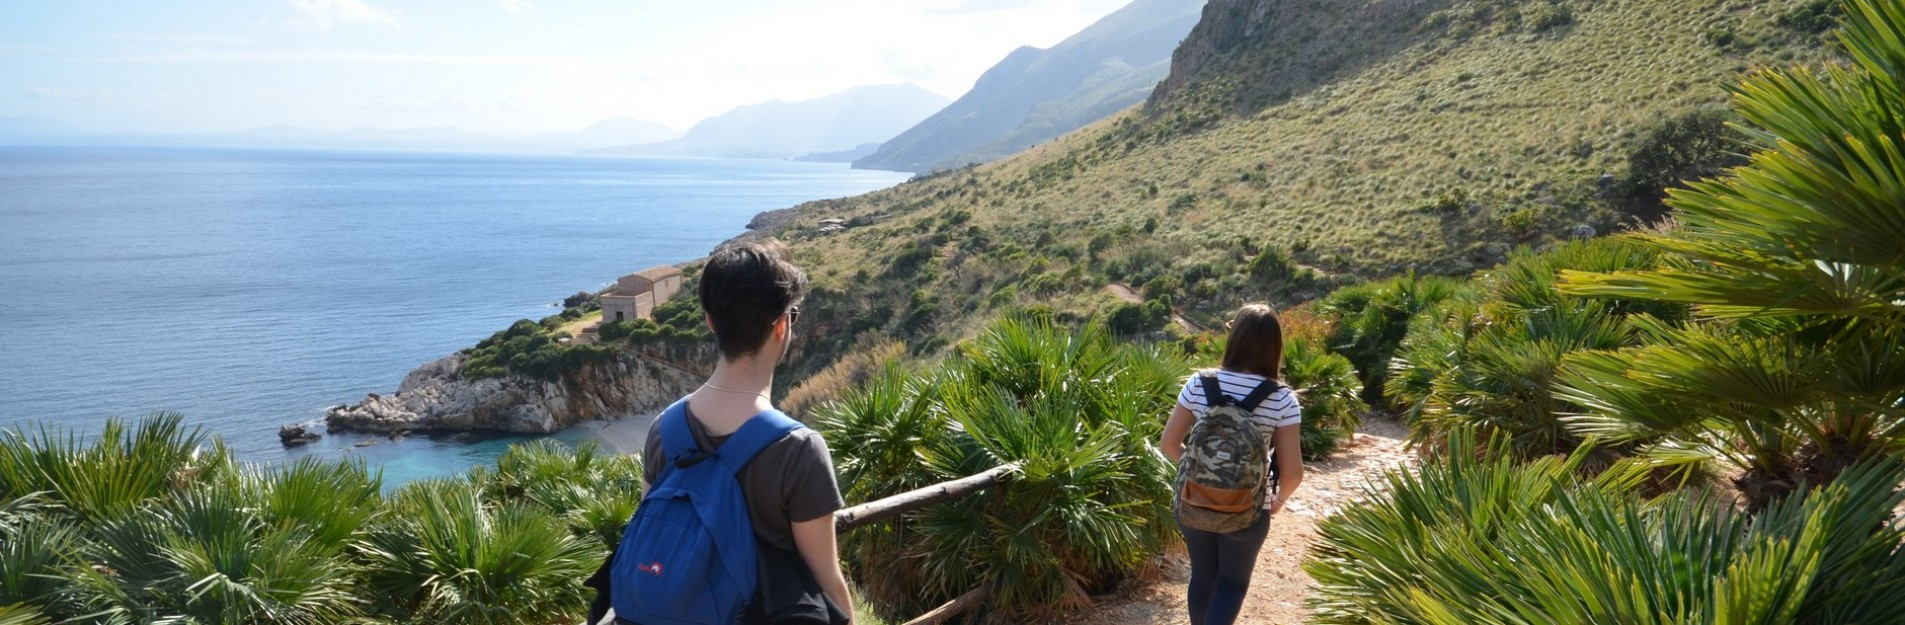 Riserva dello zingaro...trekking vista mare